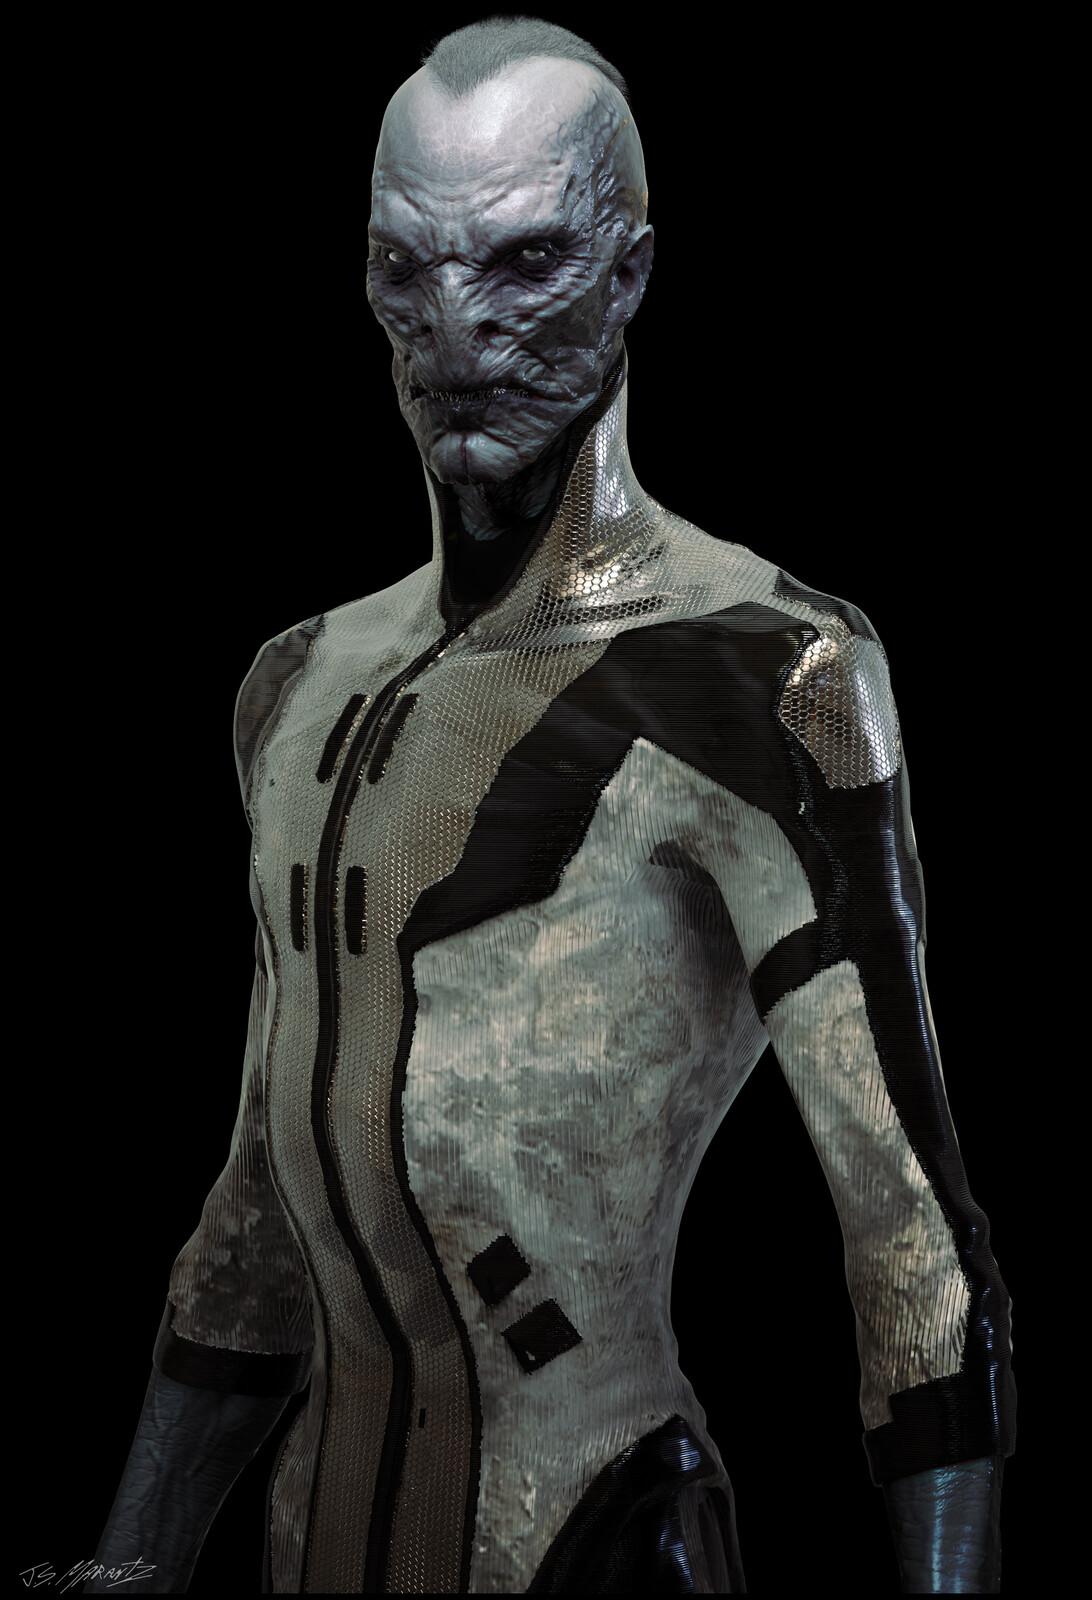 Avengers Infinity War: Ebony Maw Concept Art